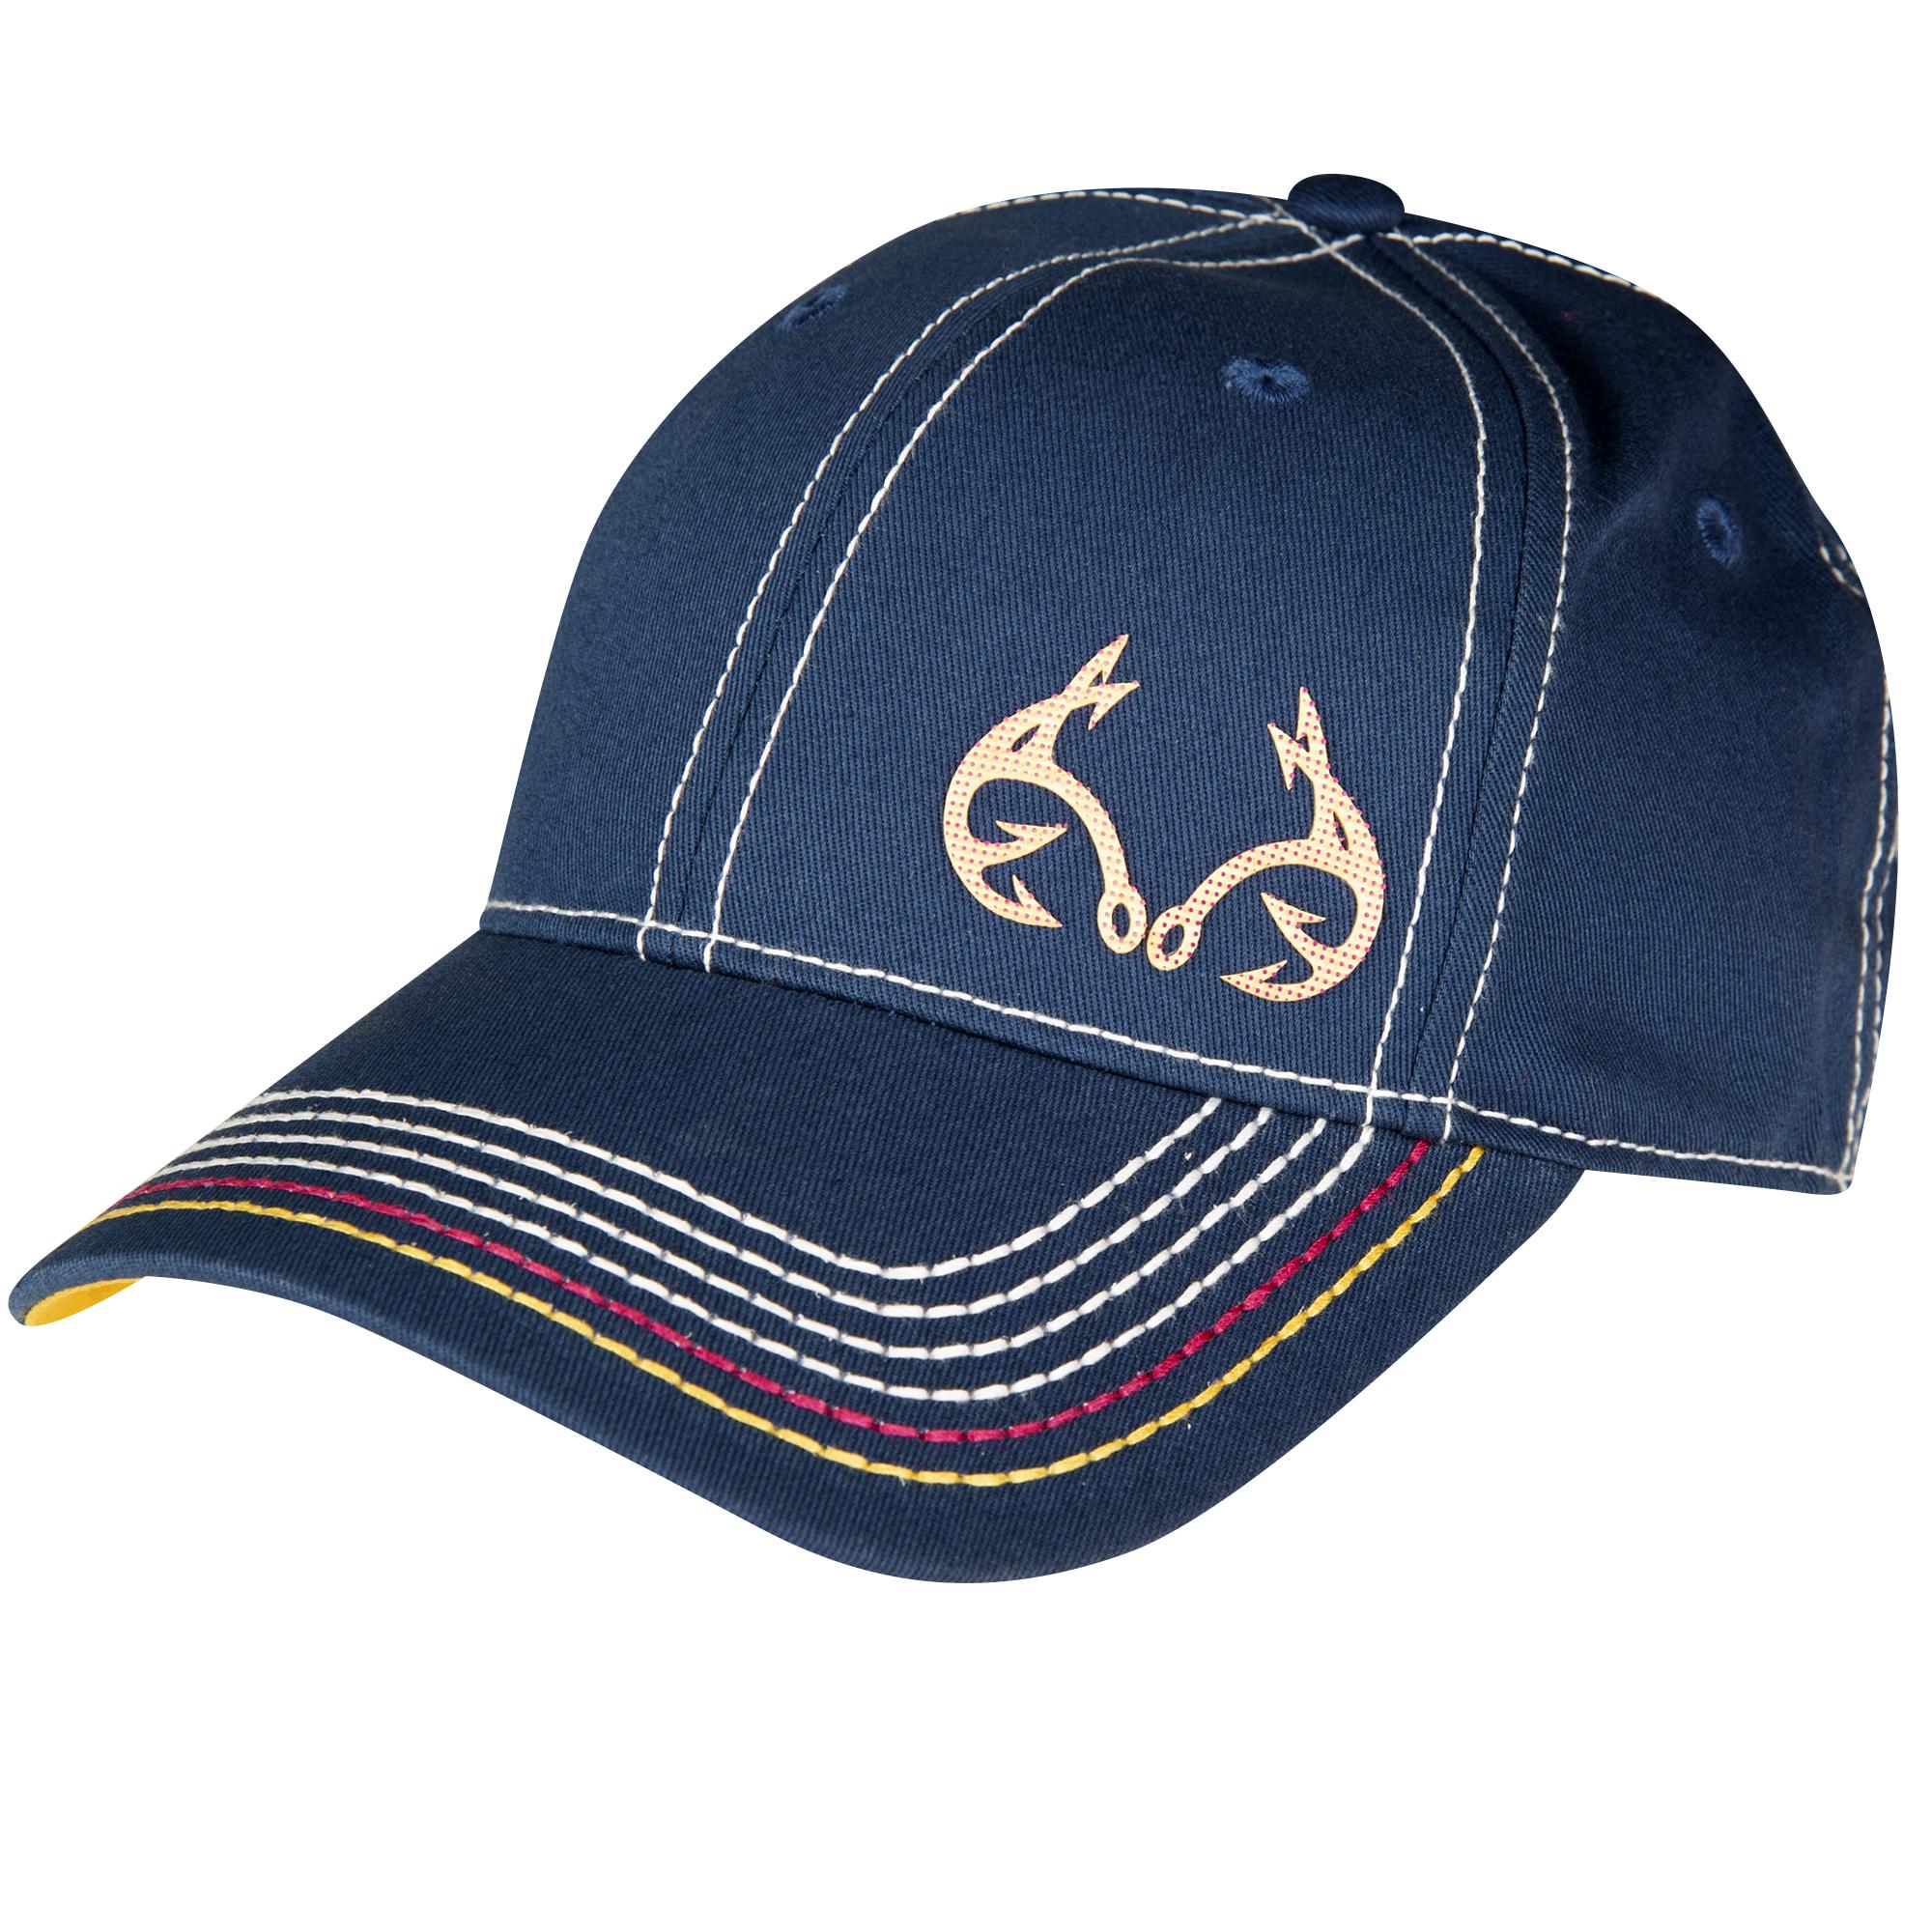 Realtree Women's Antlers Logo Fishing Hat